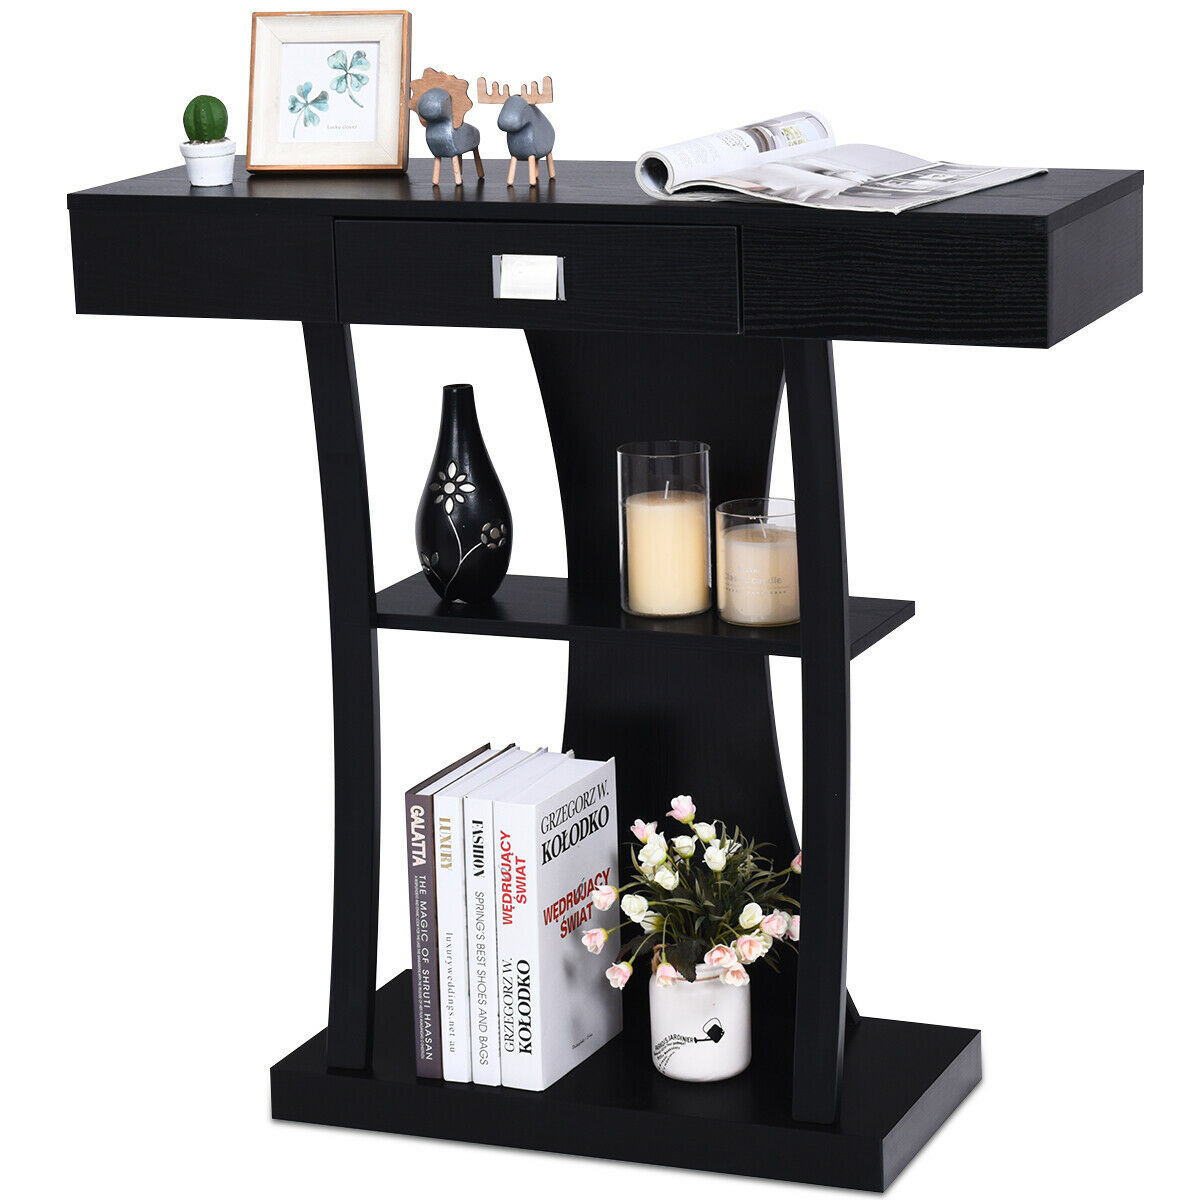 Console Table Sofa Entry Hallway Desk Storage Display Shelves